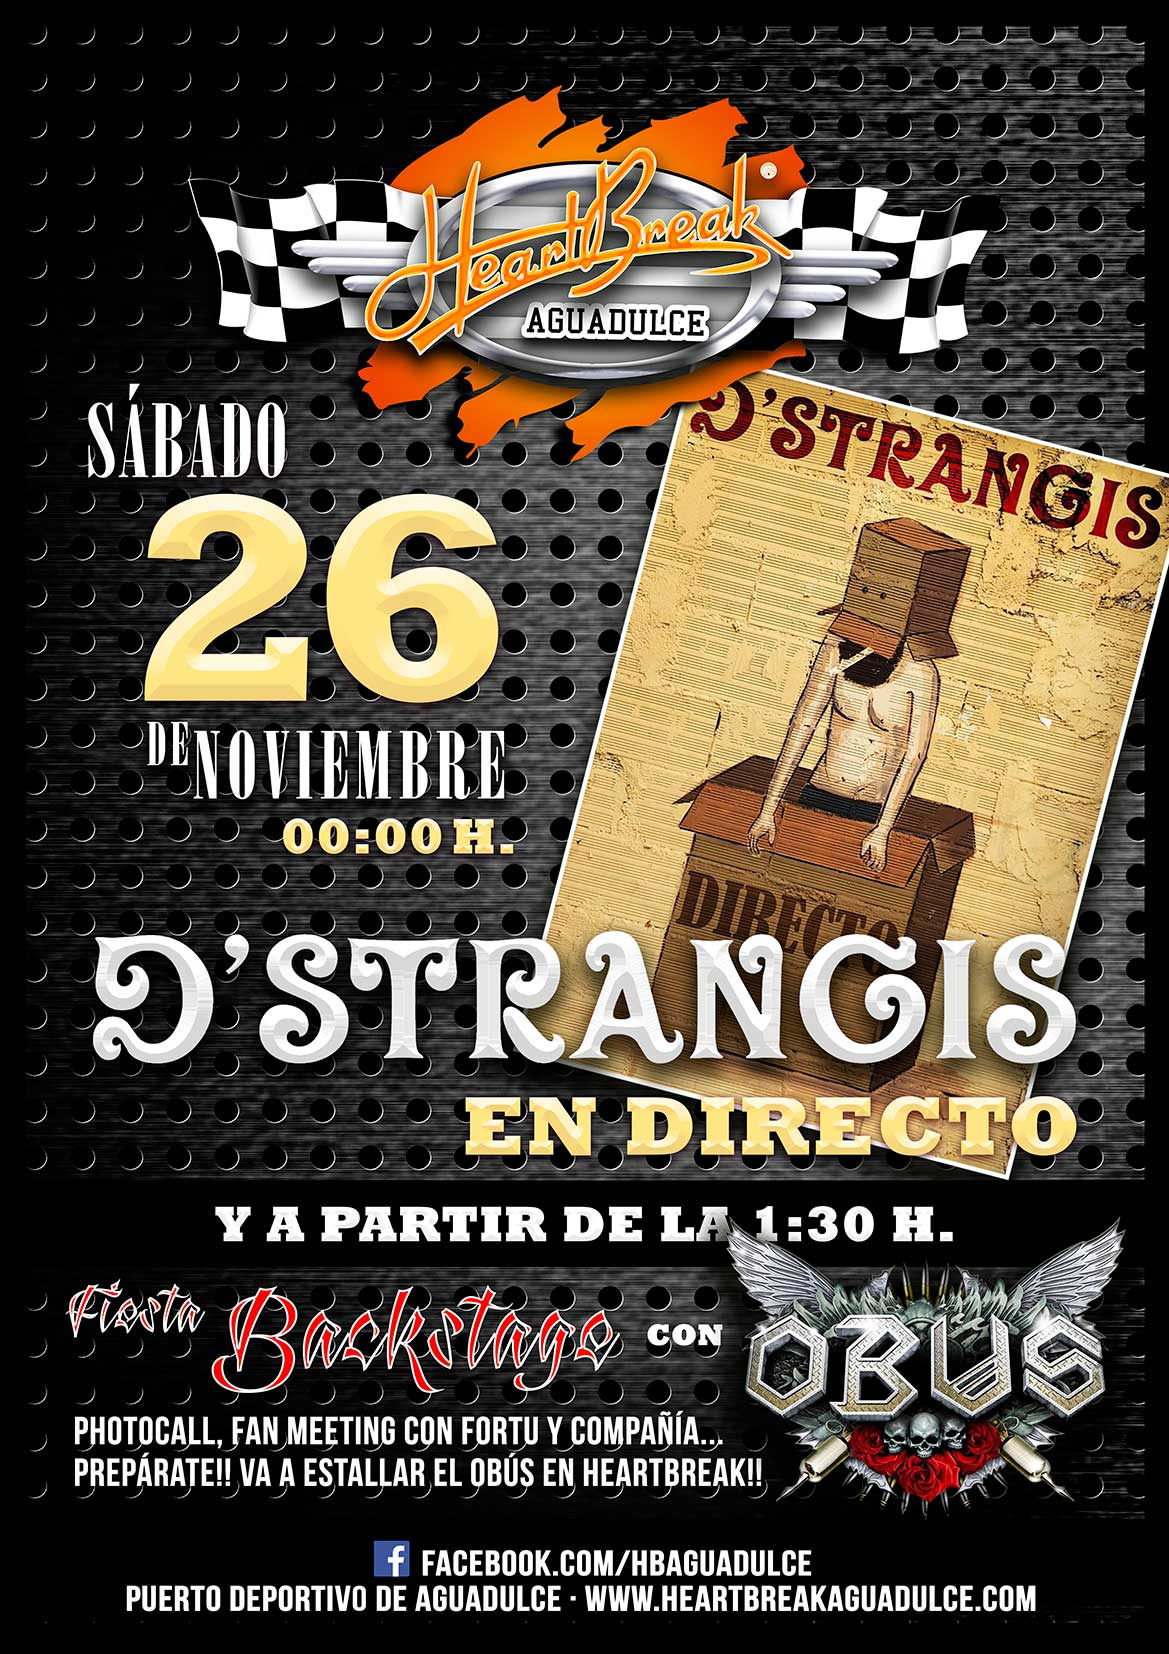 Dstrangis y Fiesta Backstage